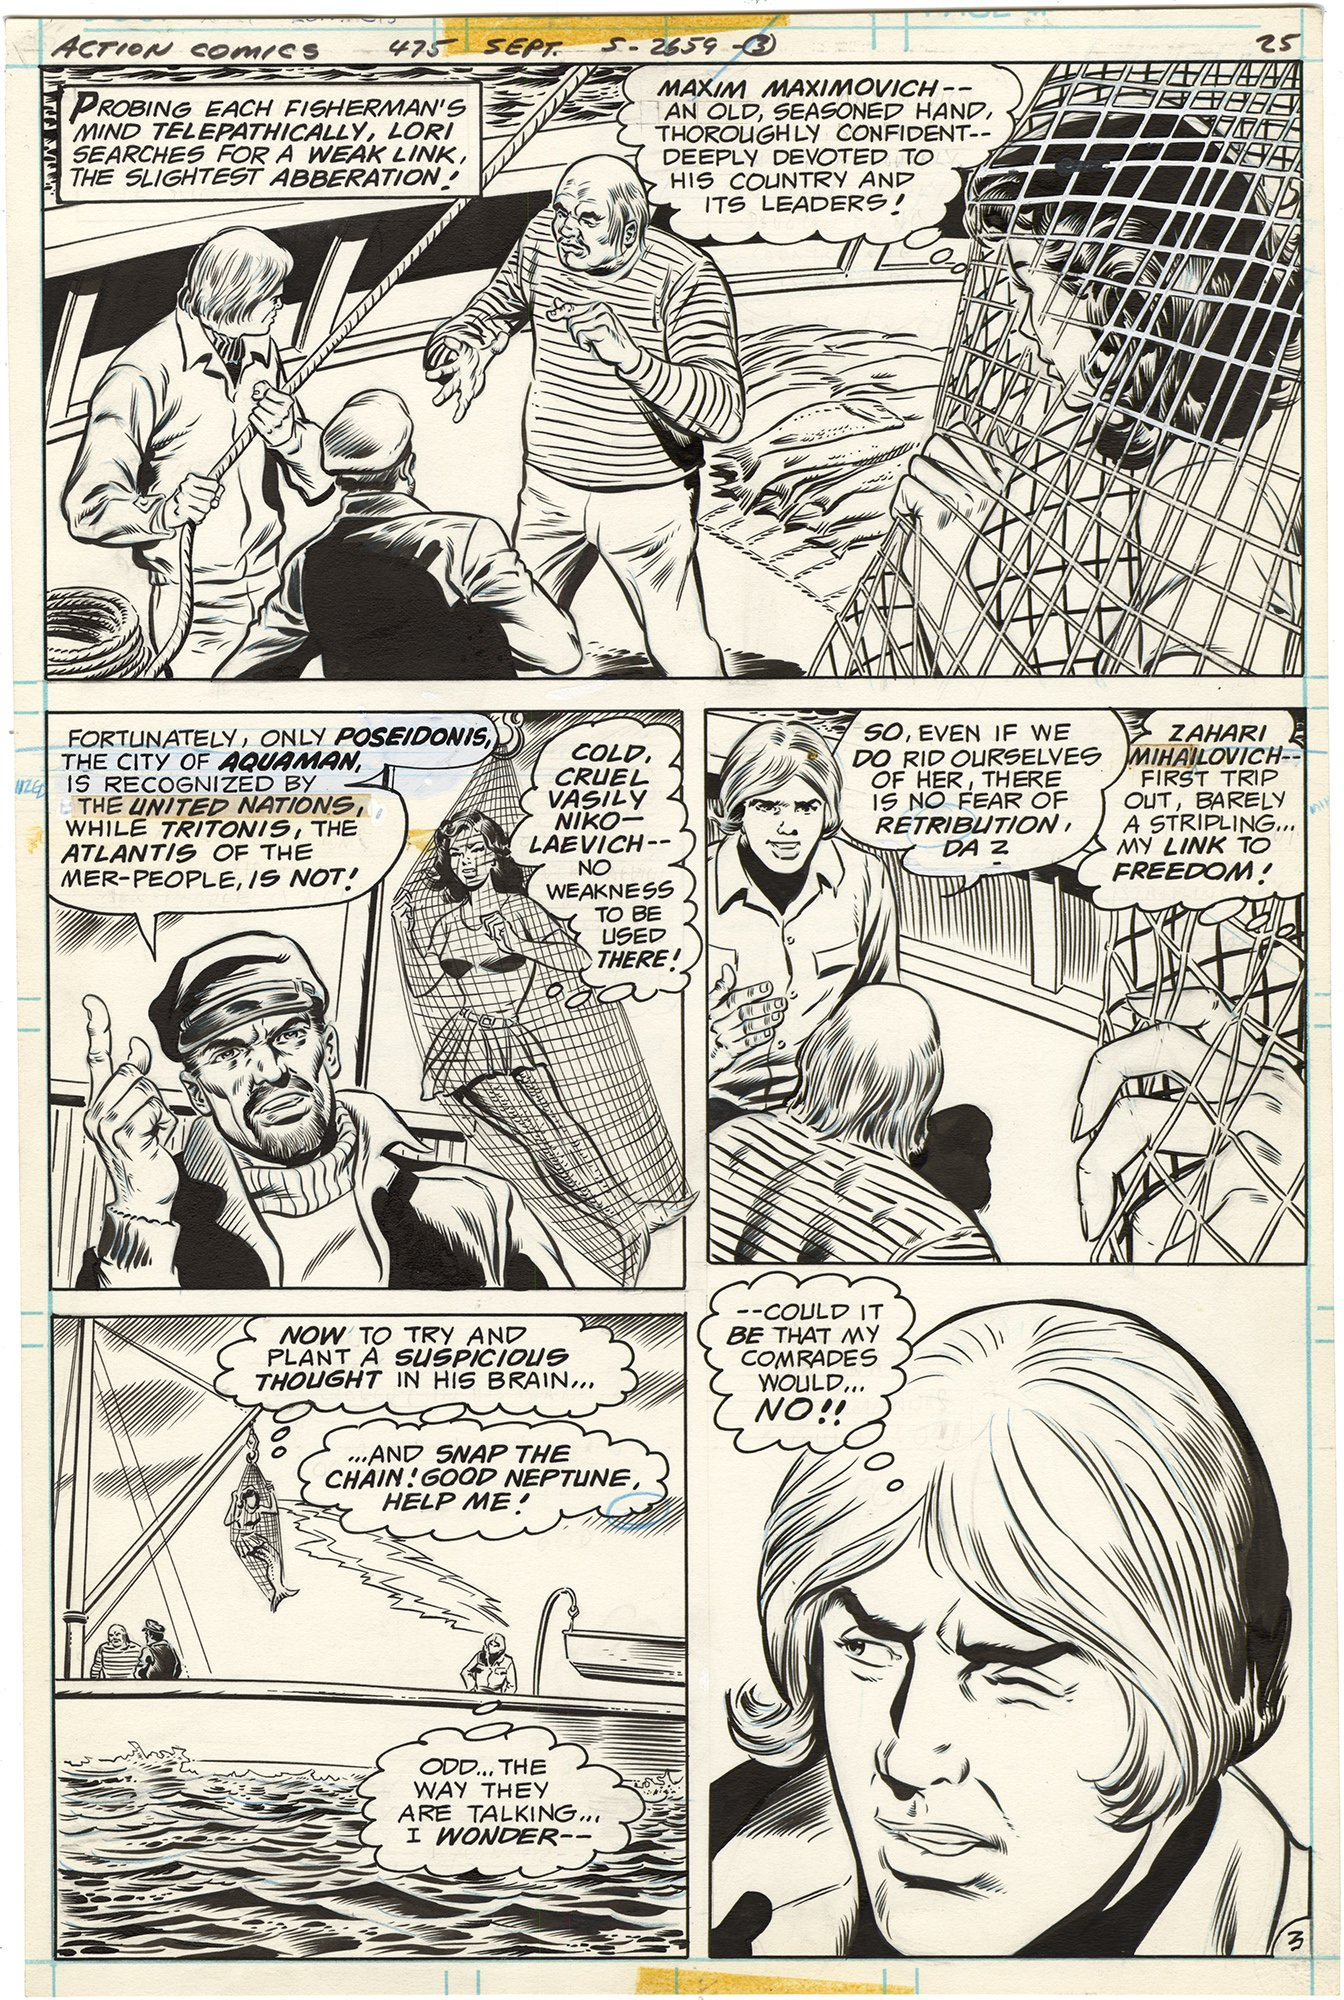 Action Comics #475 p3